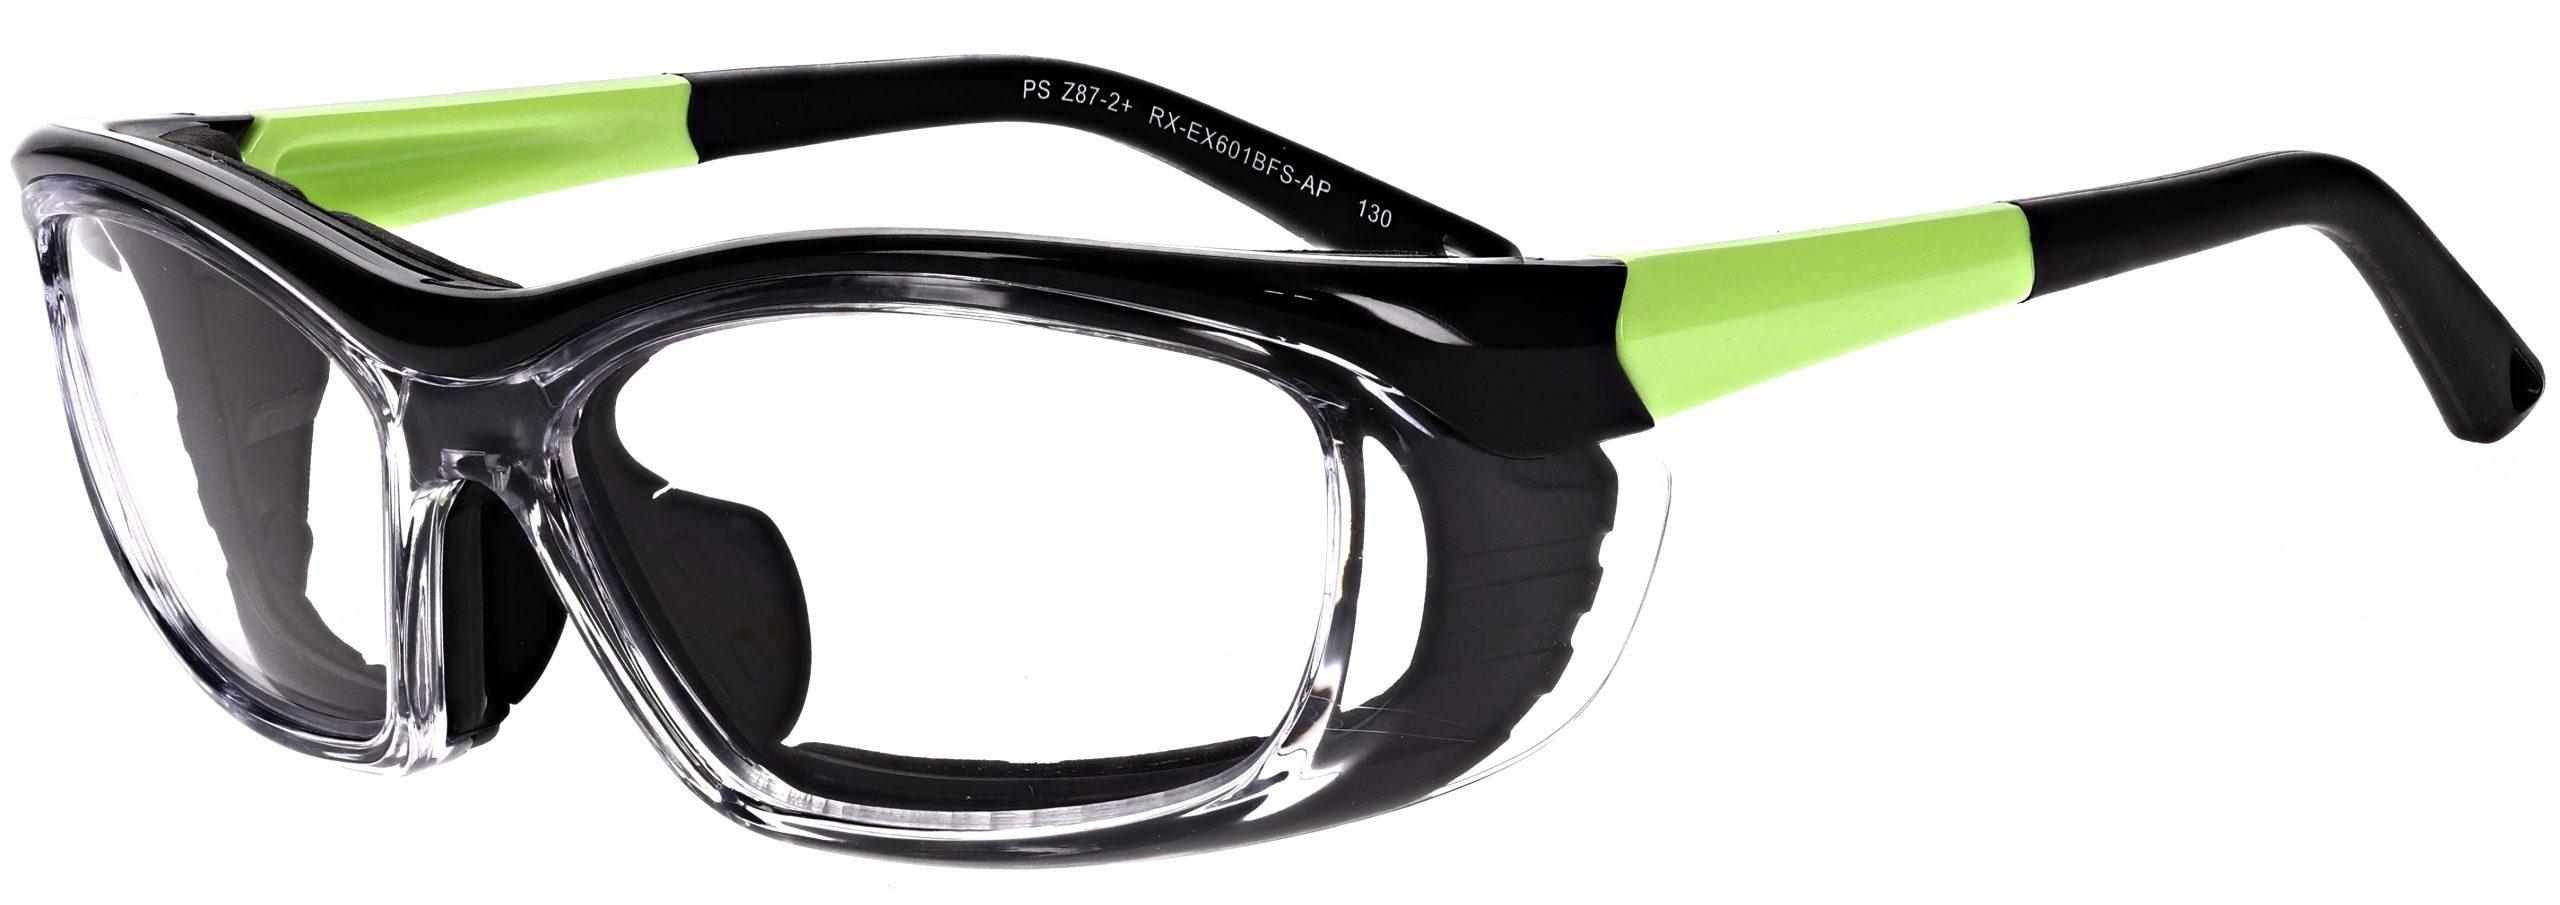 Model RX-EX601 Safety Glasses in Matte Apple Green RX-EX601BFS-AP